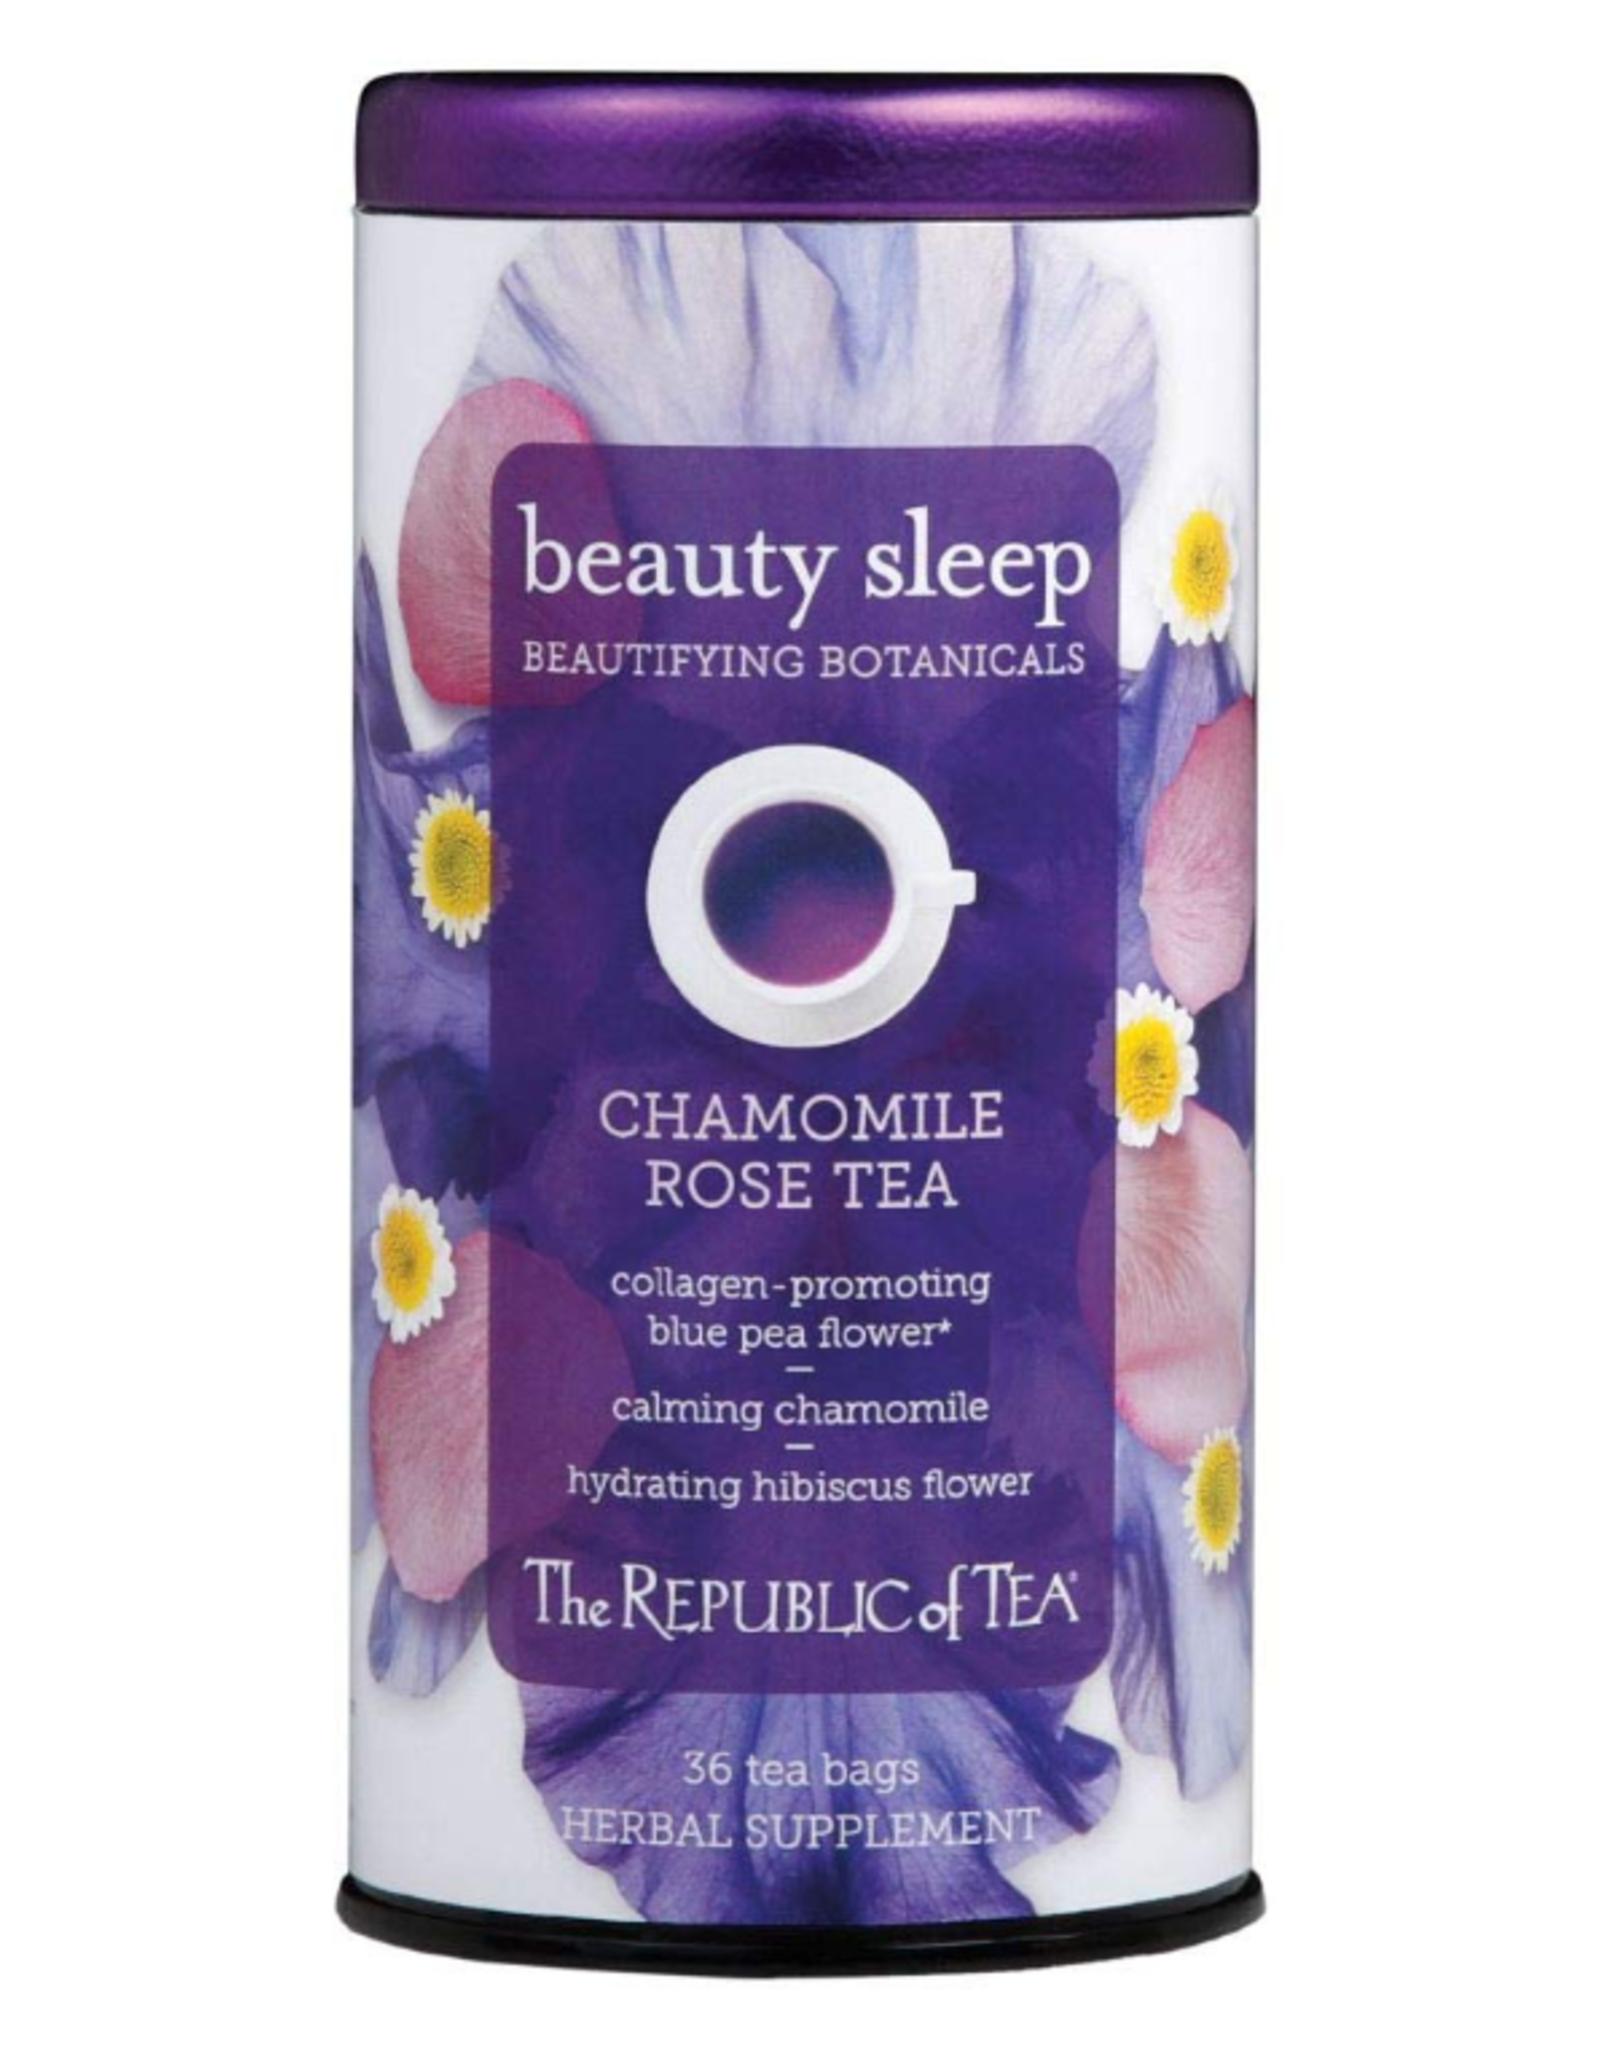 The Republic of Tea Beauty Sleep Tea 36 Bag Tin